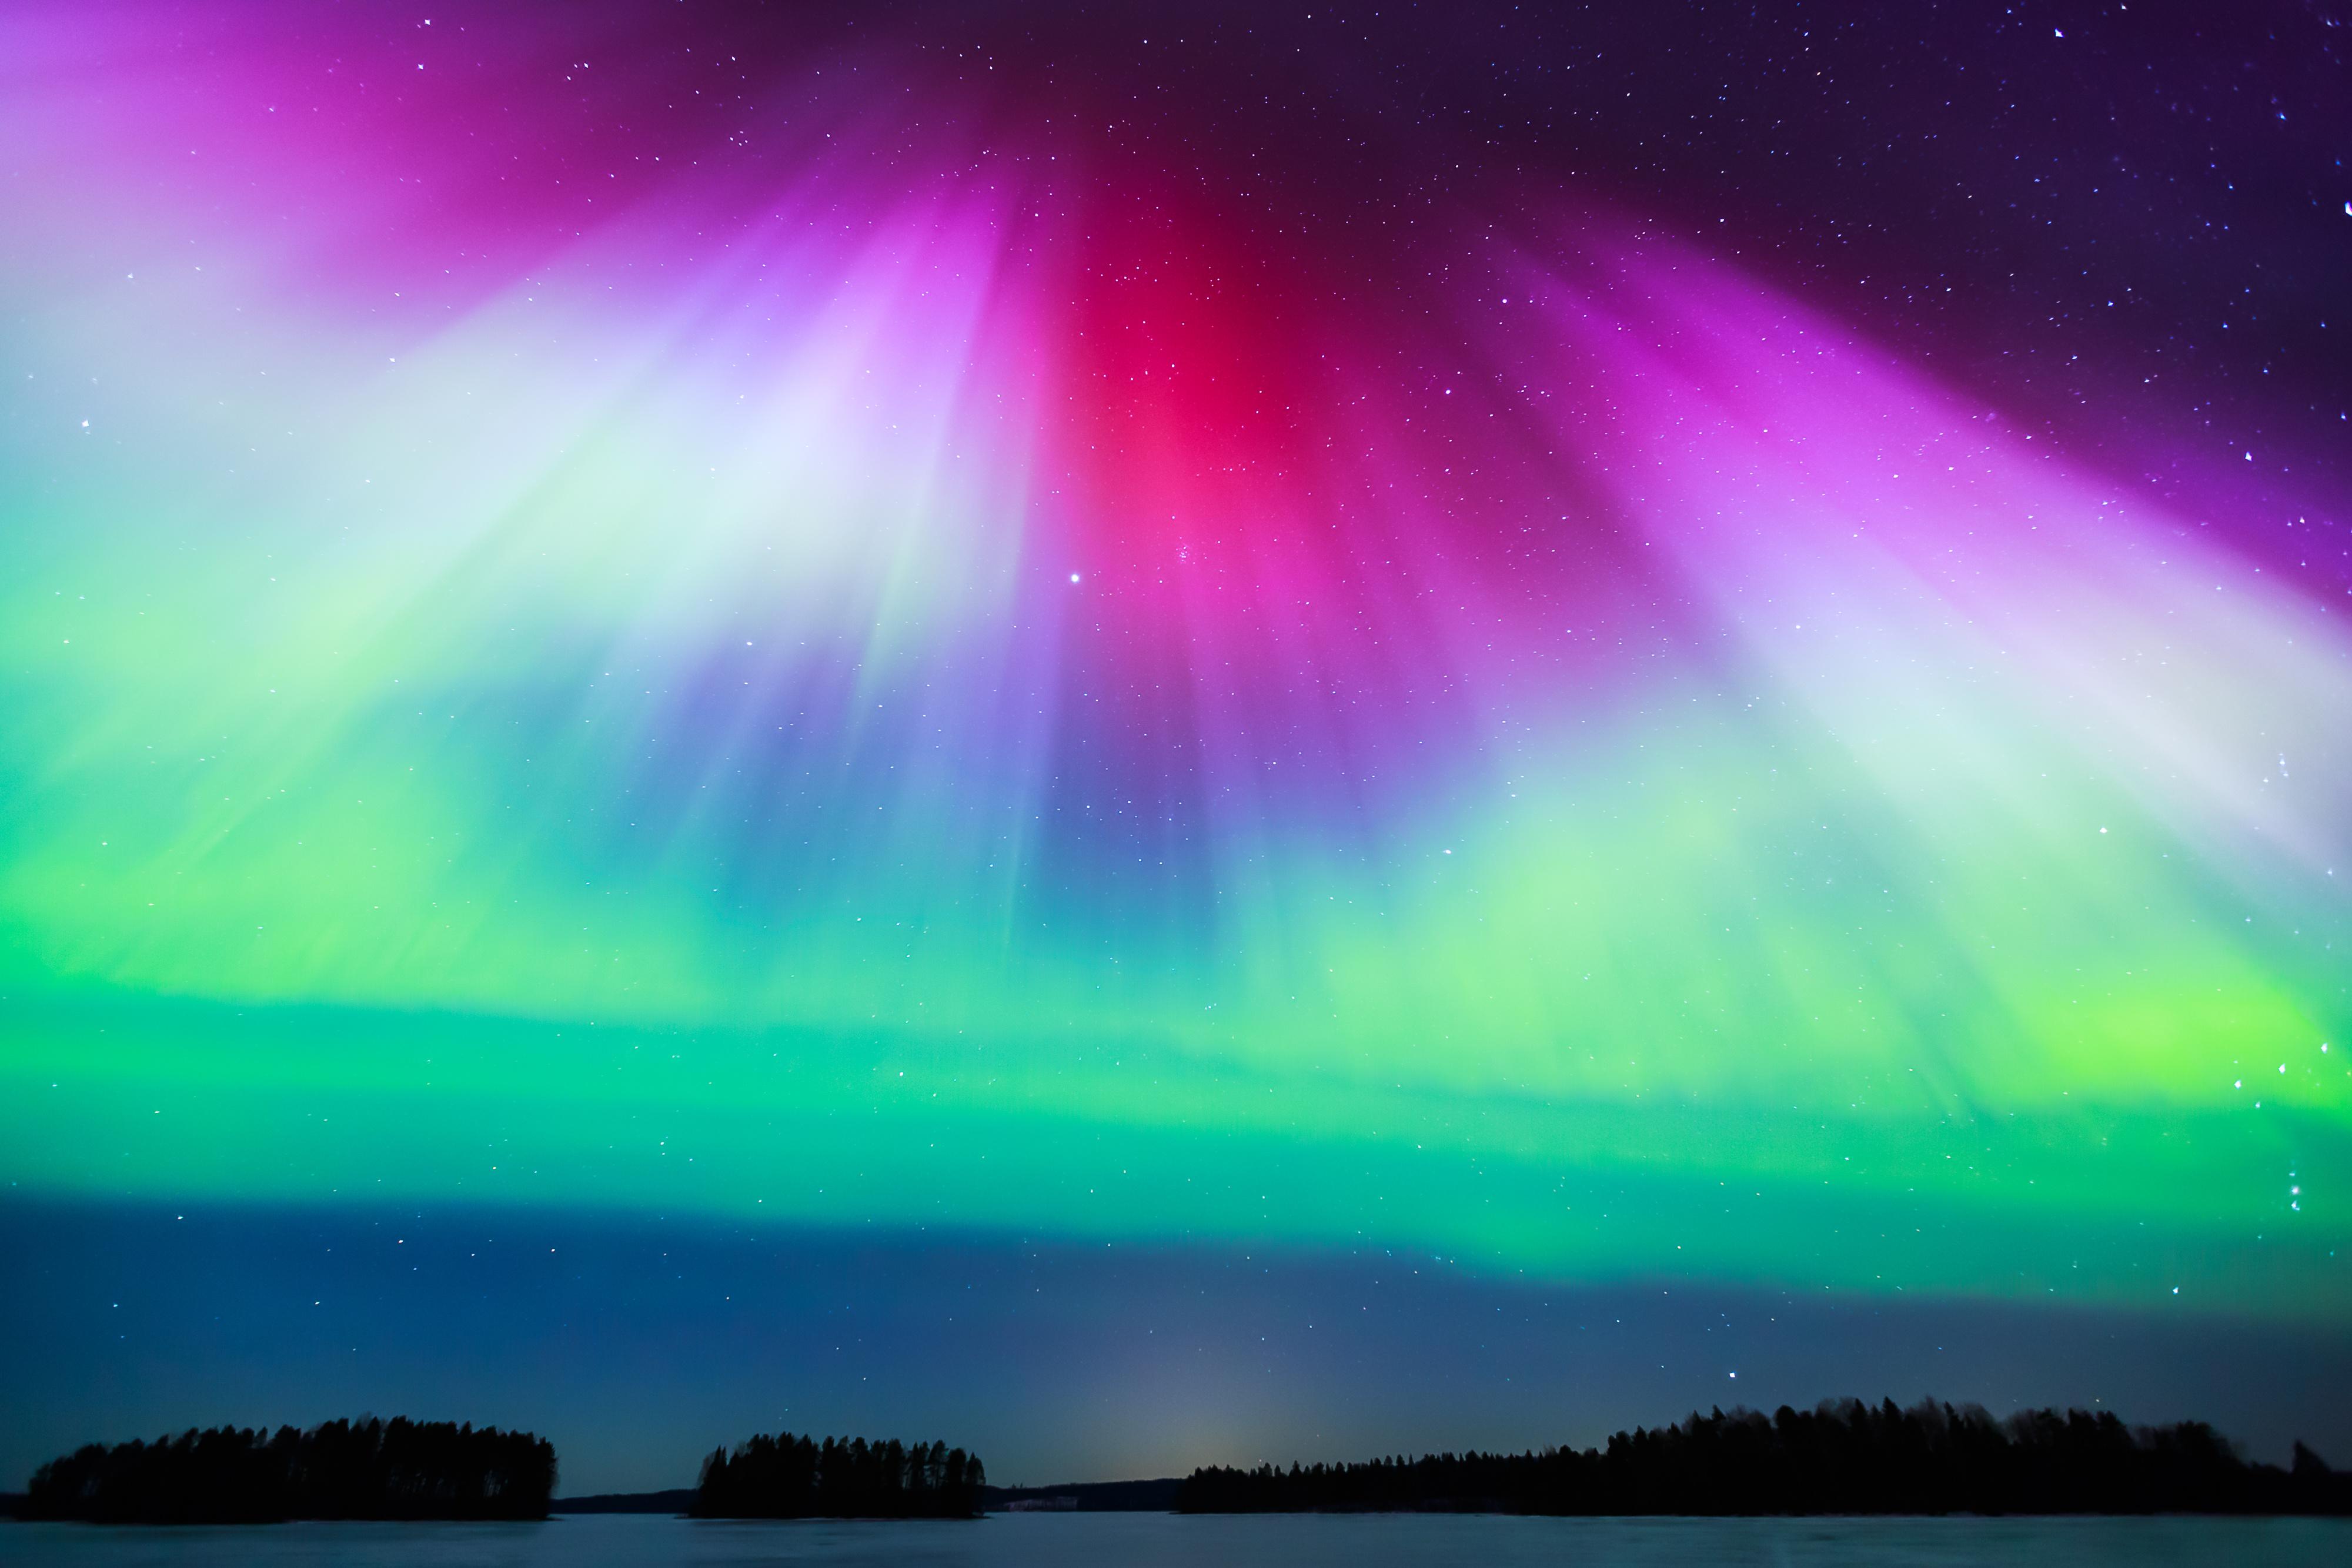 aurora borealis nature 1574937787 - Aurora Borealis Nature -